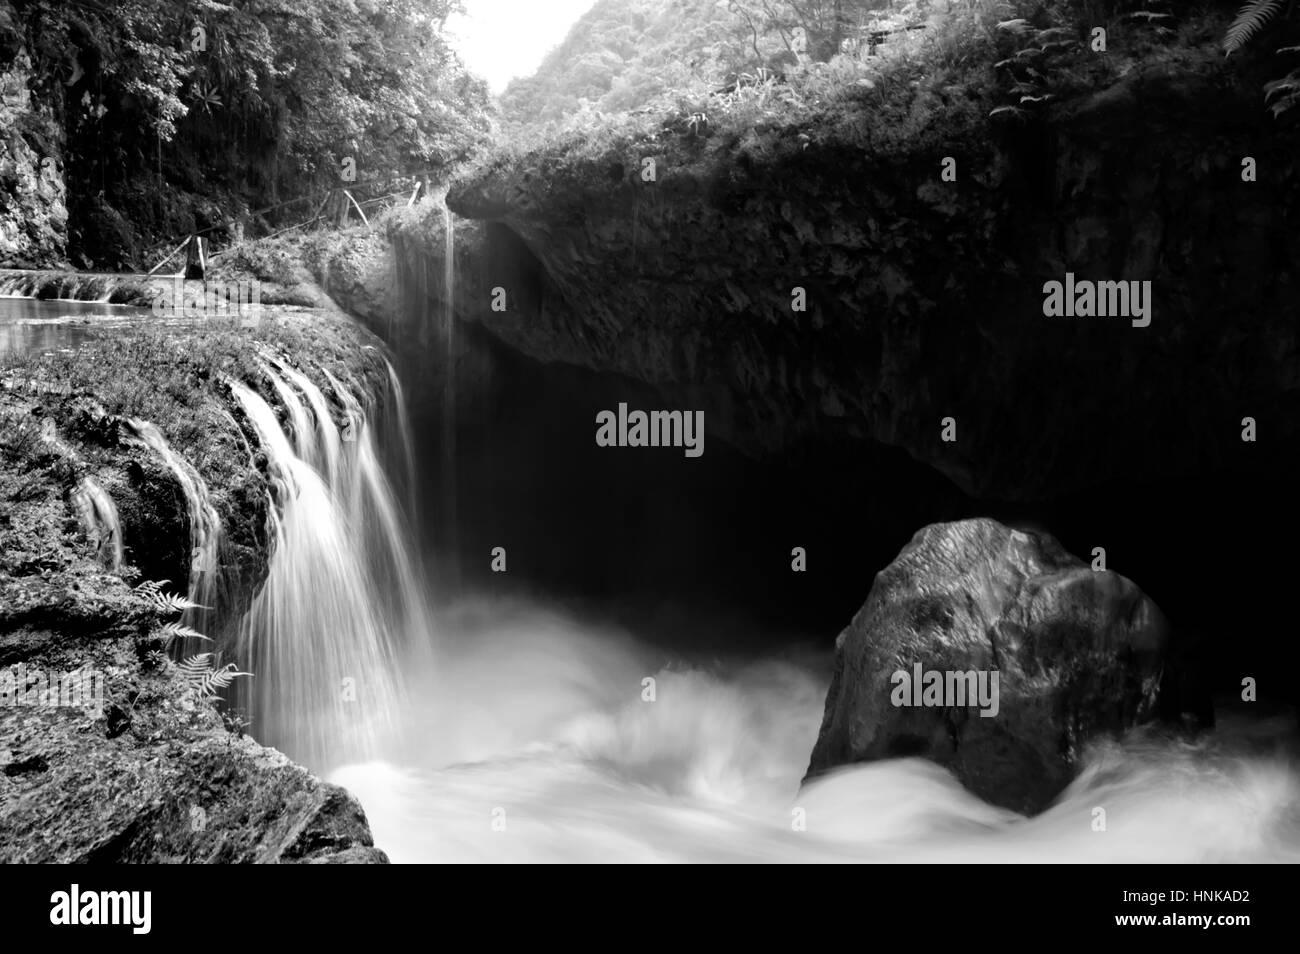 Semuc Champey, landscape in Guatemala - Stock Image